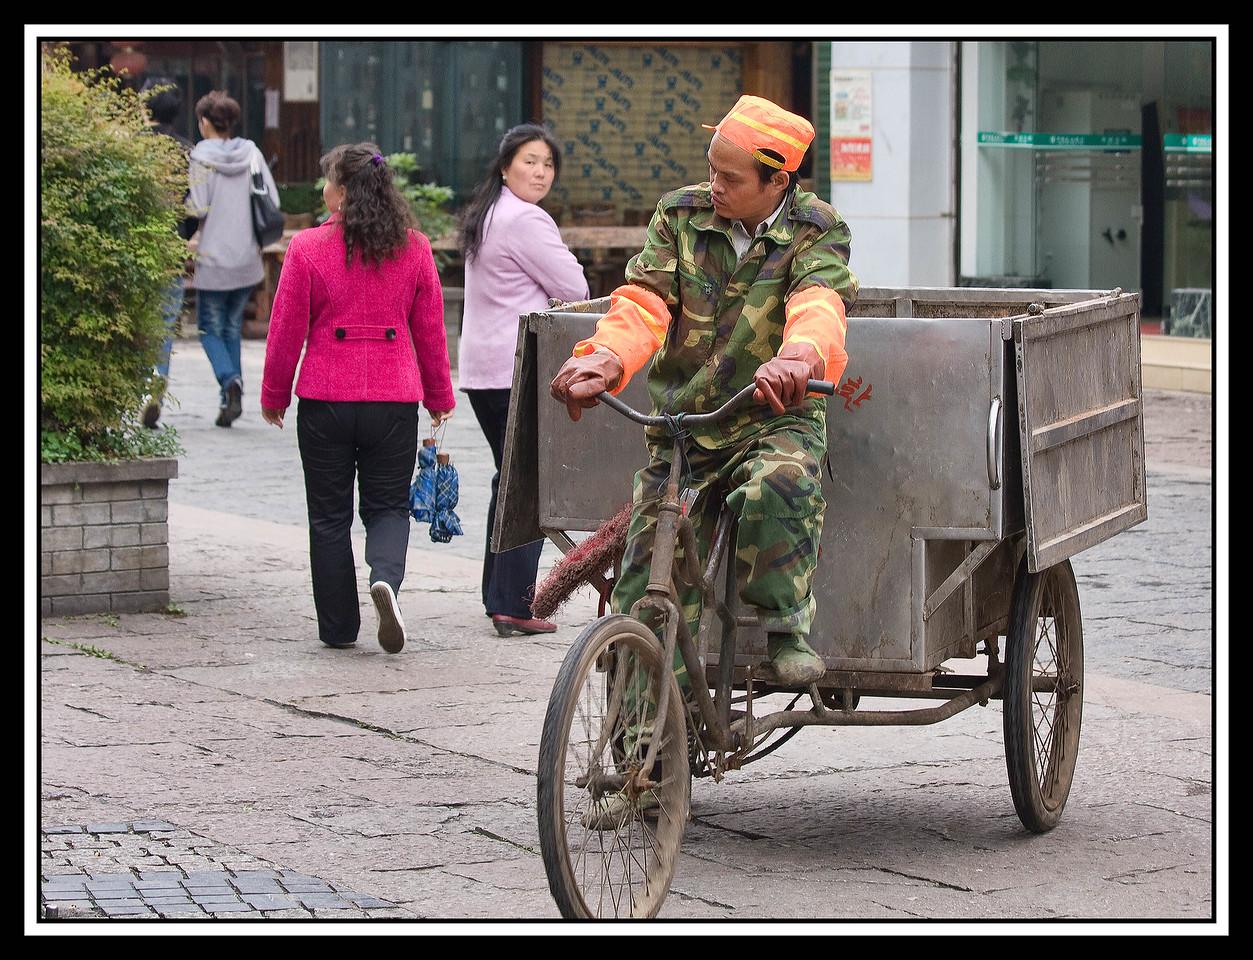 IMAGE: https://photos.smugmug.com/Travel/CHINA-FOCUS-TOUR-2010-GUILIN/i-bRXQnVm/0/45621167/X2/Guilin%20-%20Trash%20guy%20on%20three%20wheel%20bike-X2.jpg